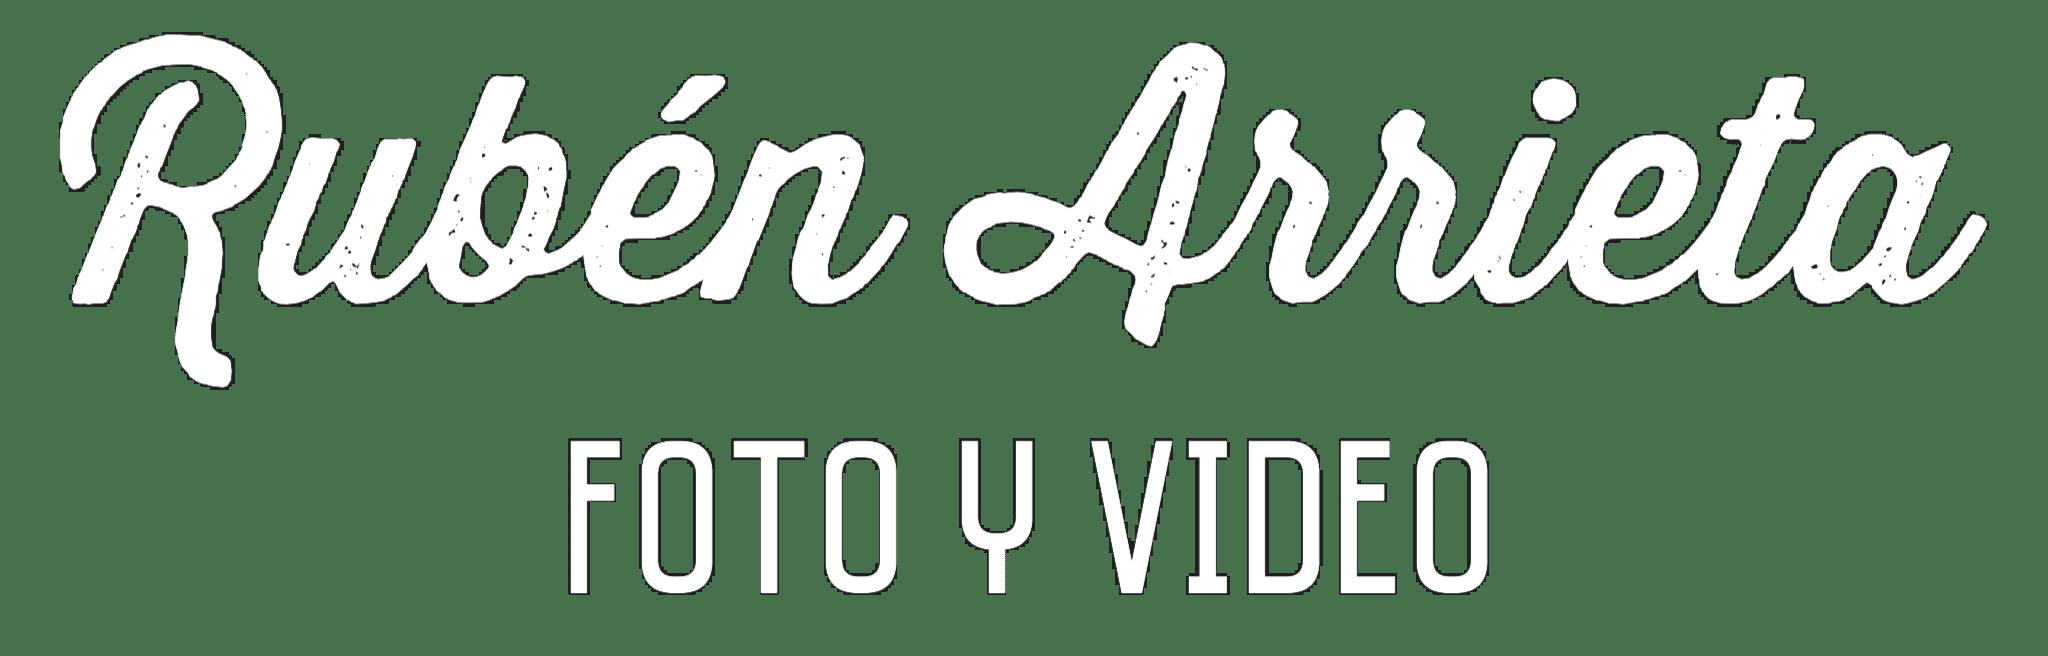 Rubén Arrieta Fotógrafo